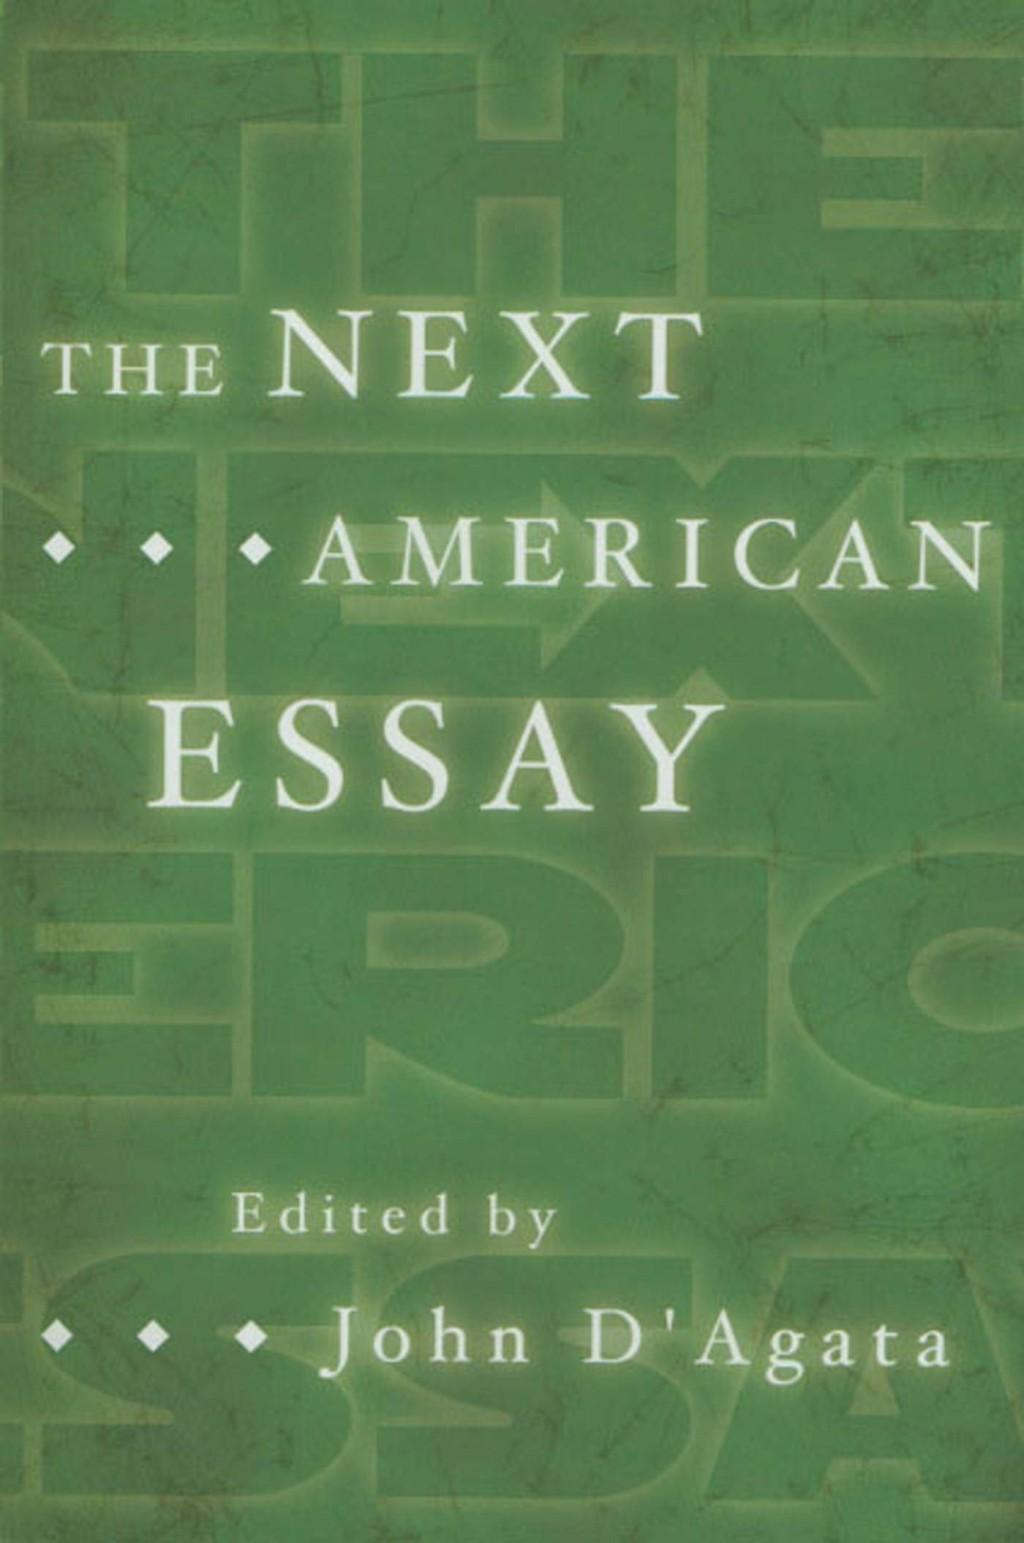 024 61uwmdqvqdl American Essay Striking Best Writers Creed Contest Identity Titles Large